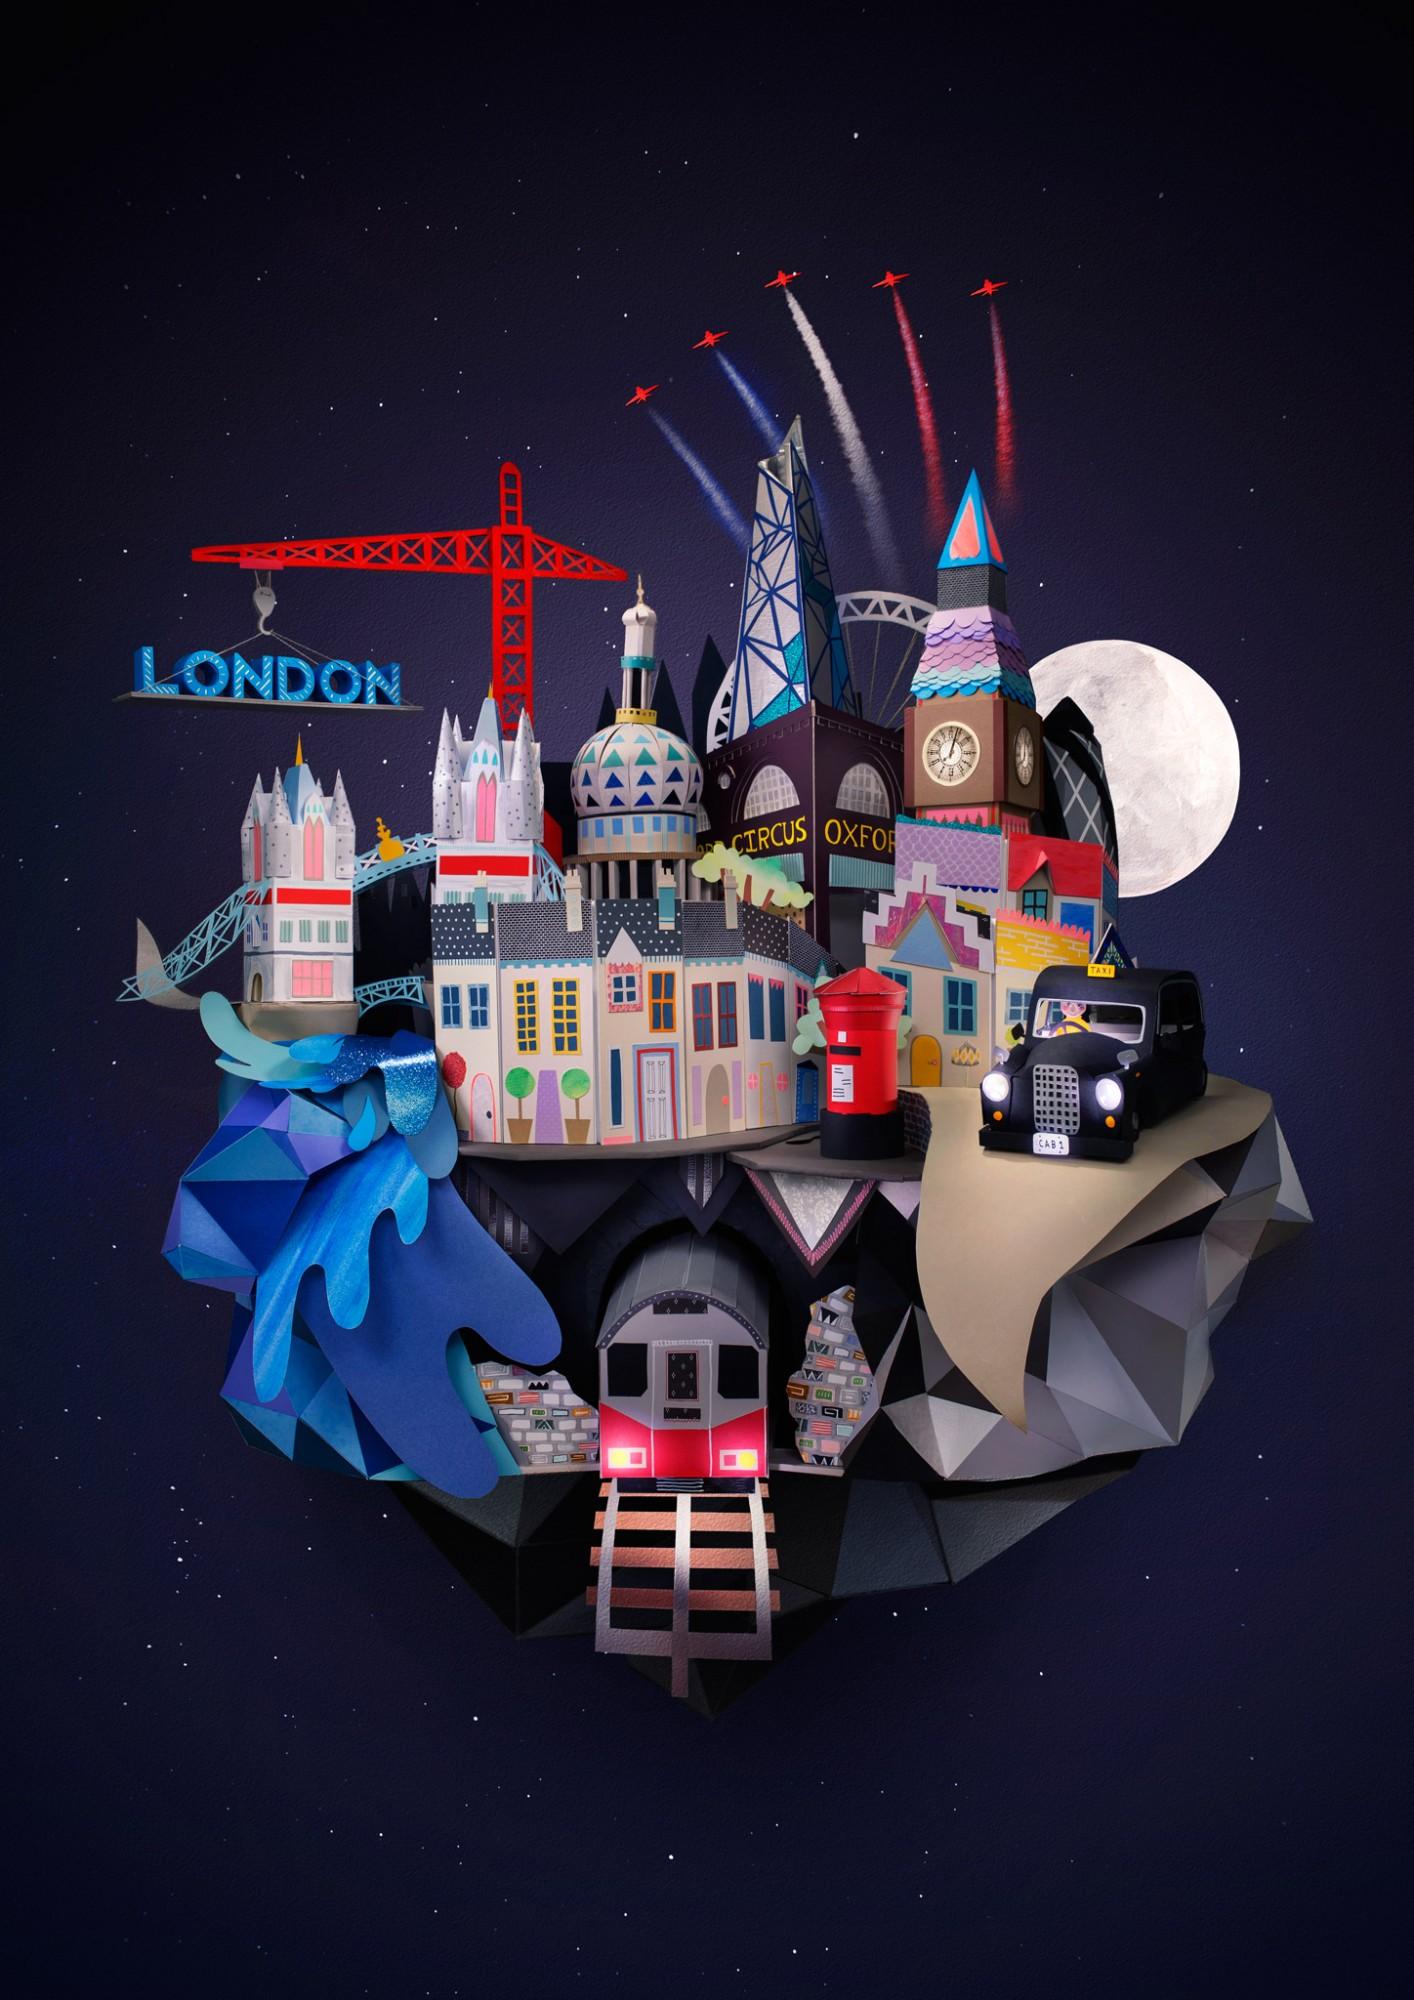 Interview with Paper Artist Sam Pierpoint - Paper London